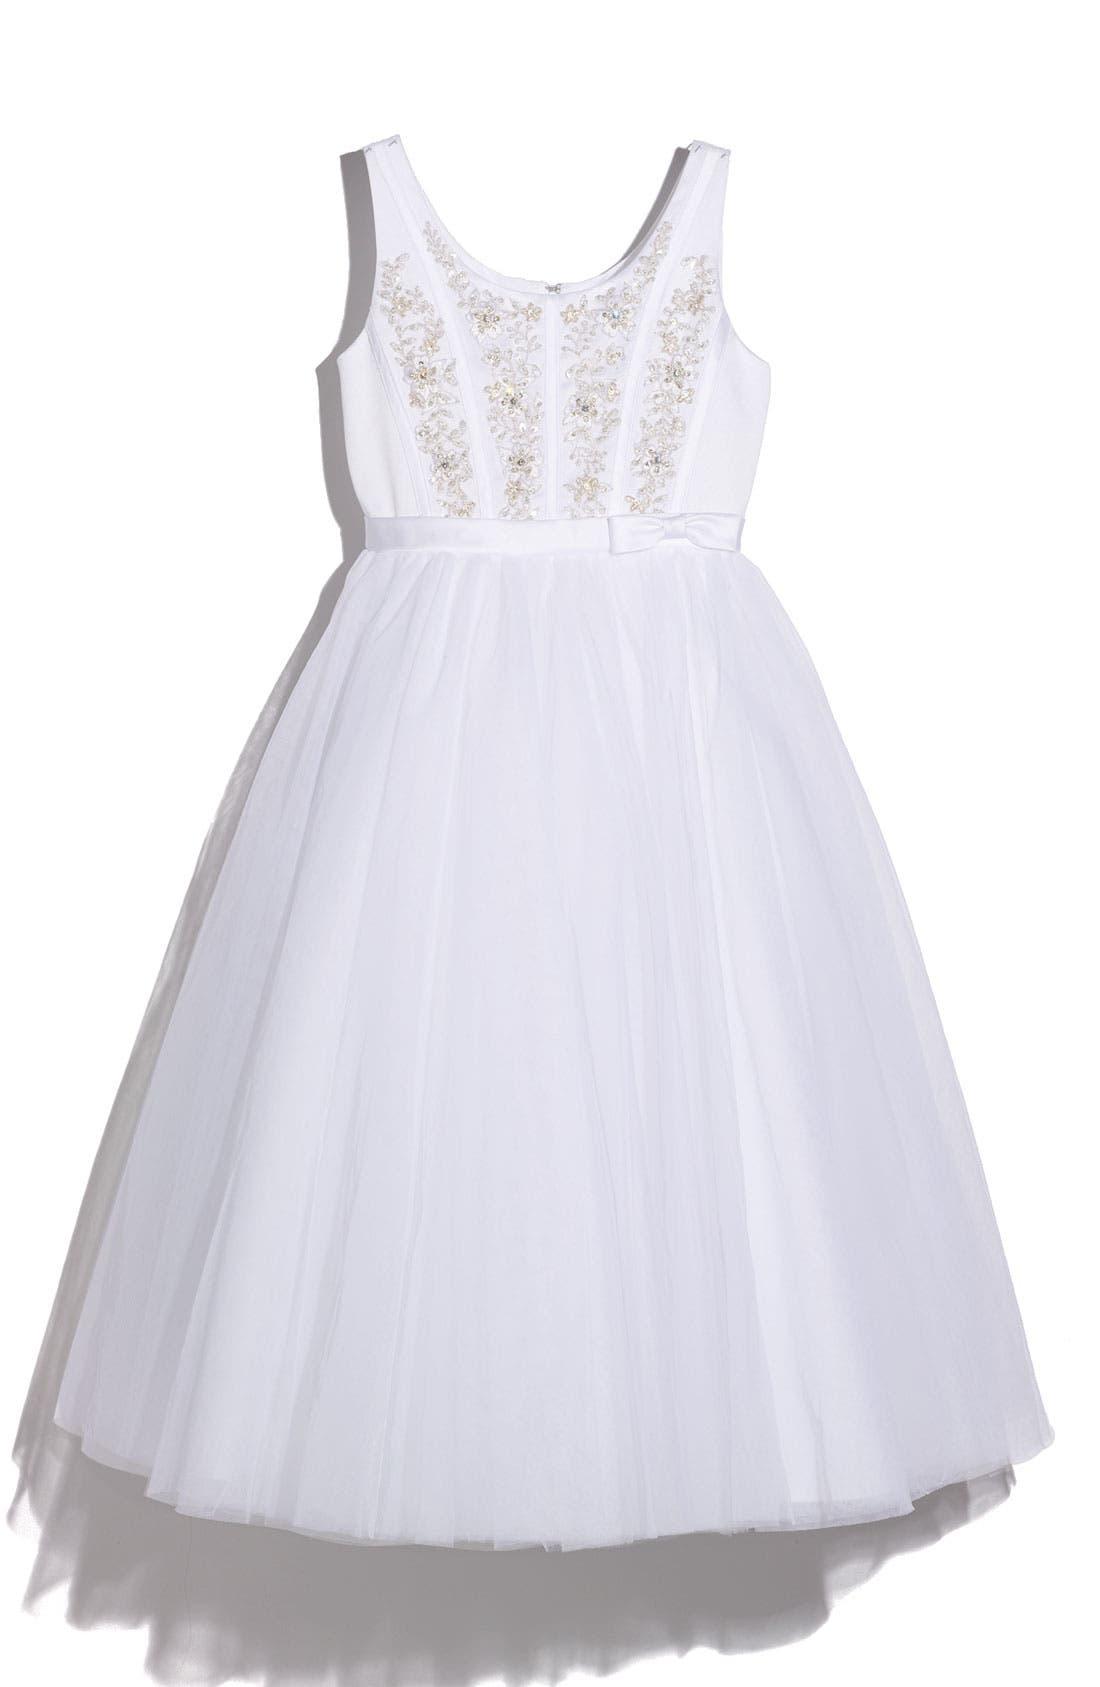 Main Image - Joan Calabrese for Mon Cheri Satin Sequin Dress (Big Girls)